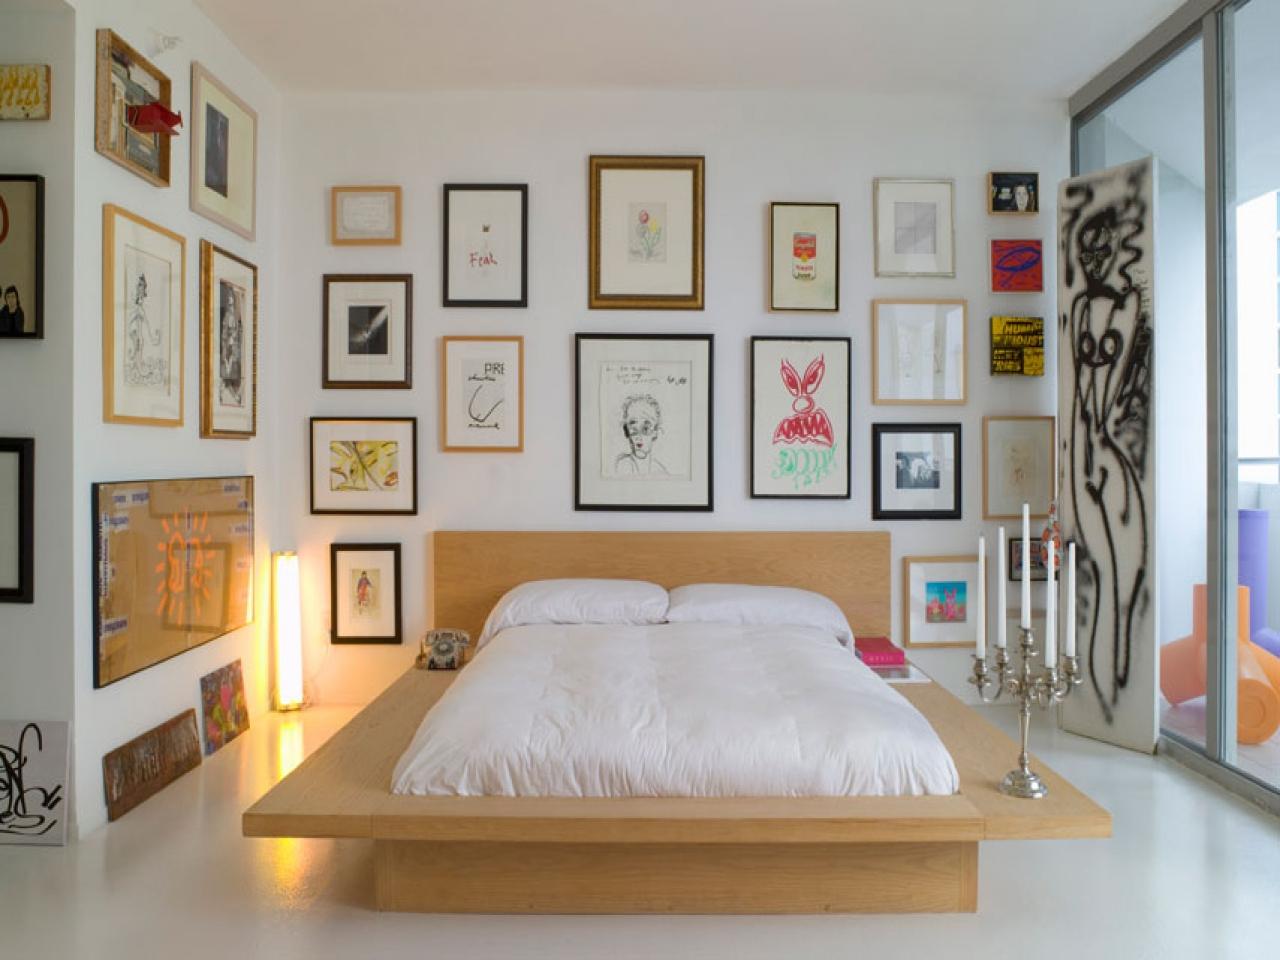 11 Idea Deko Bilik Tidur Kecil Terbaru 2018 Dekor Rumah